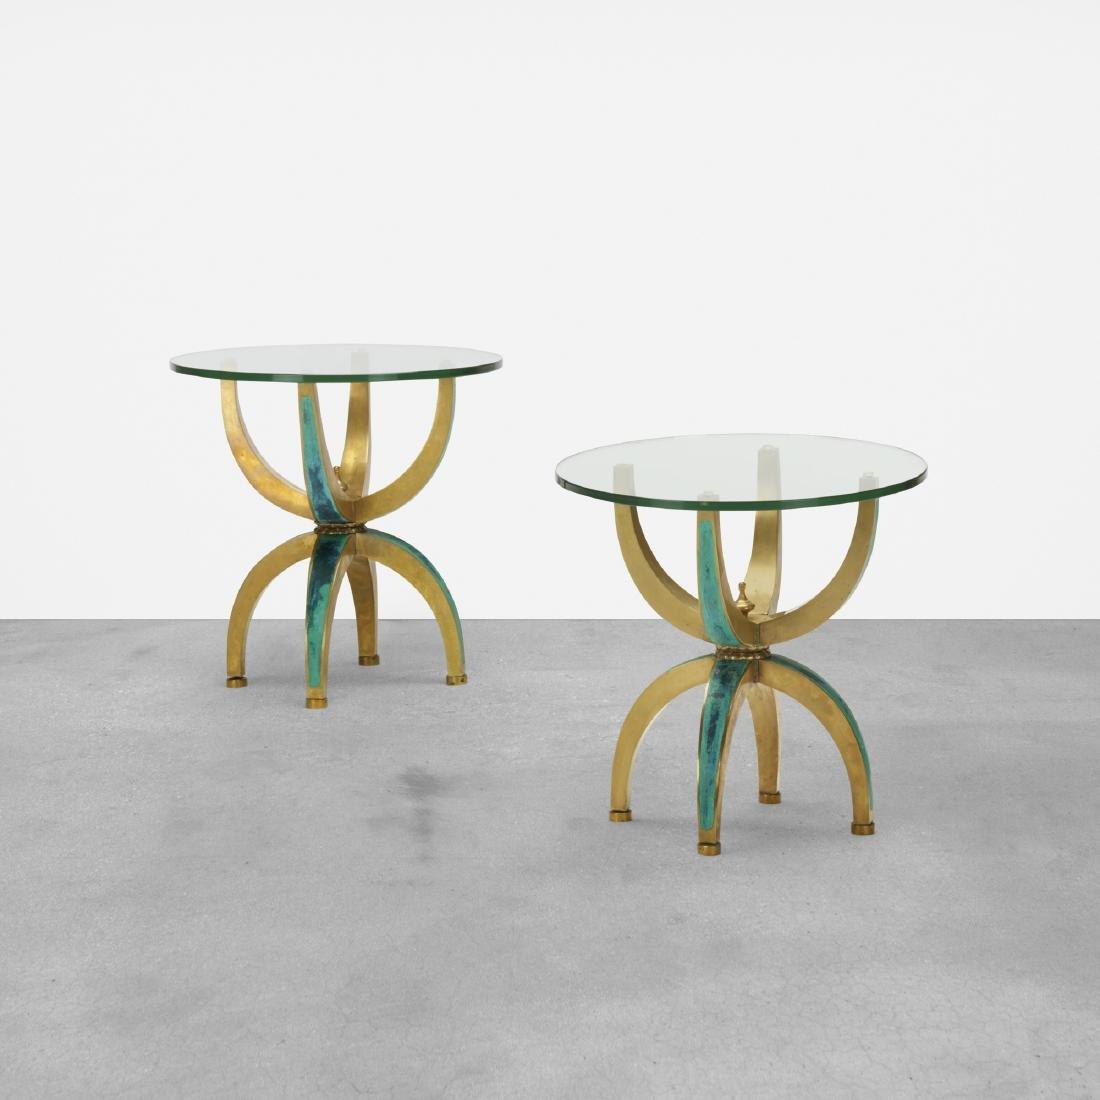 Pepe Mendoza, occasional tables, pair